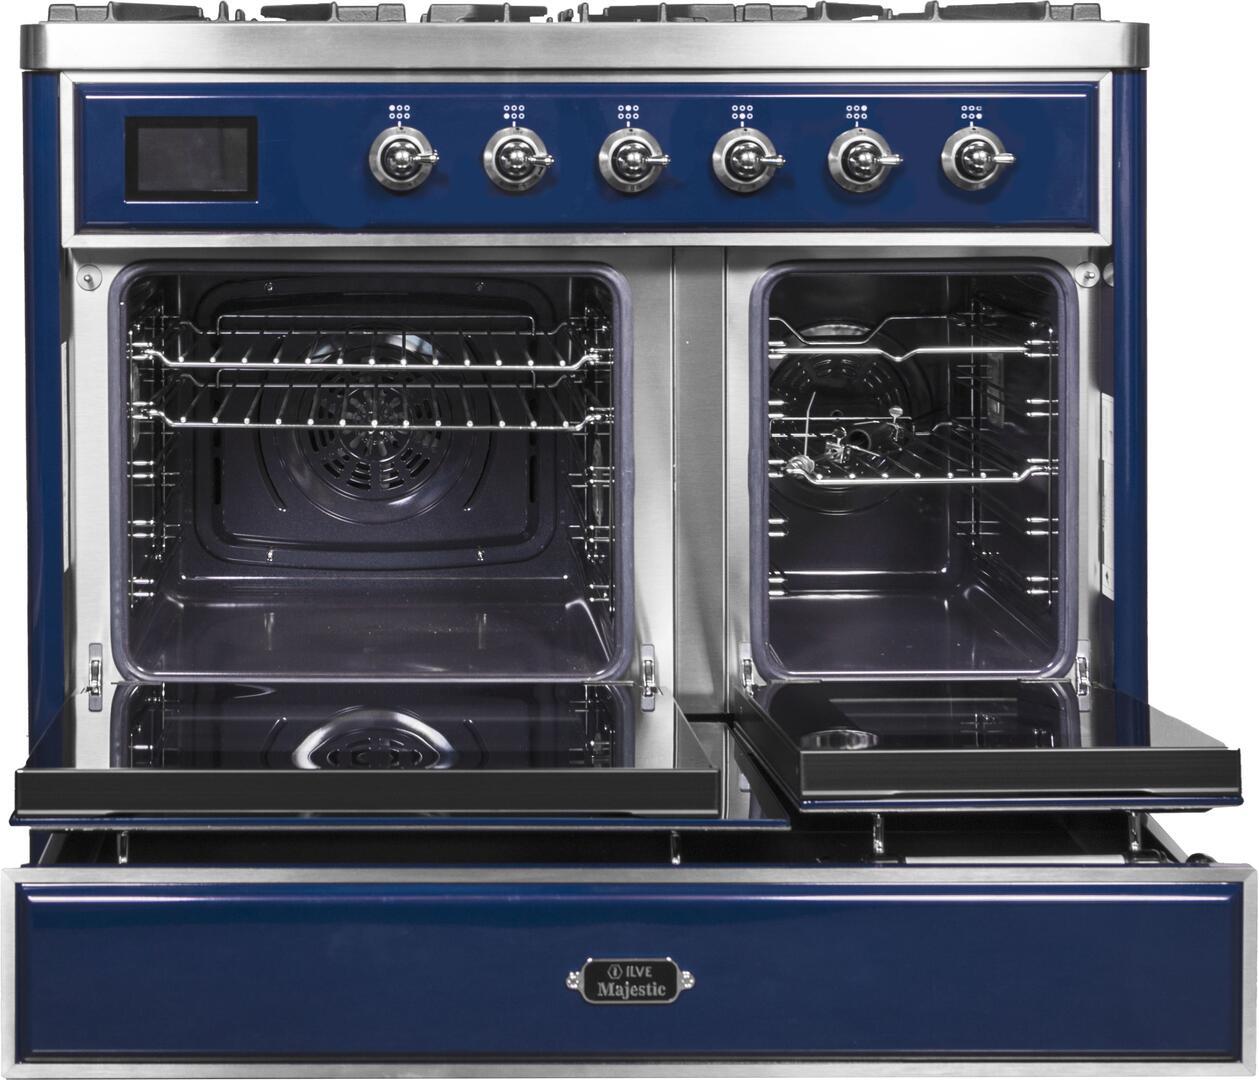 Ilve Majestic II UMD10FDNS3MBC Freestanding Dual Fuel Range Blue, UMD10FDNS3MBC Oven Doors Opened